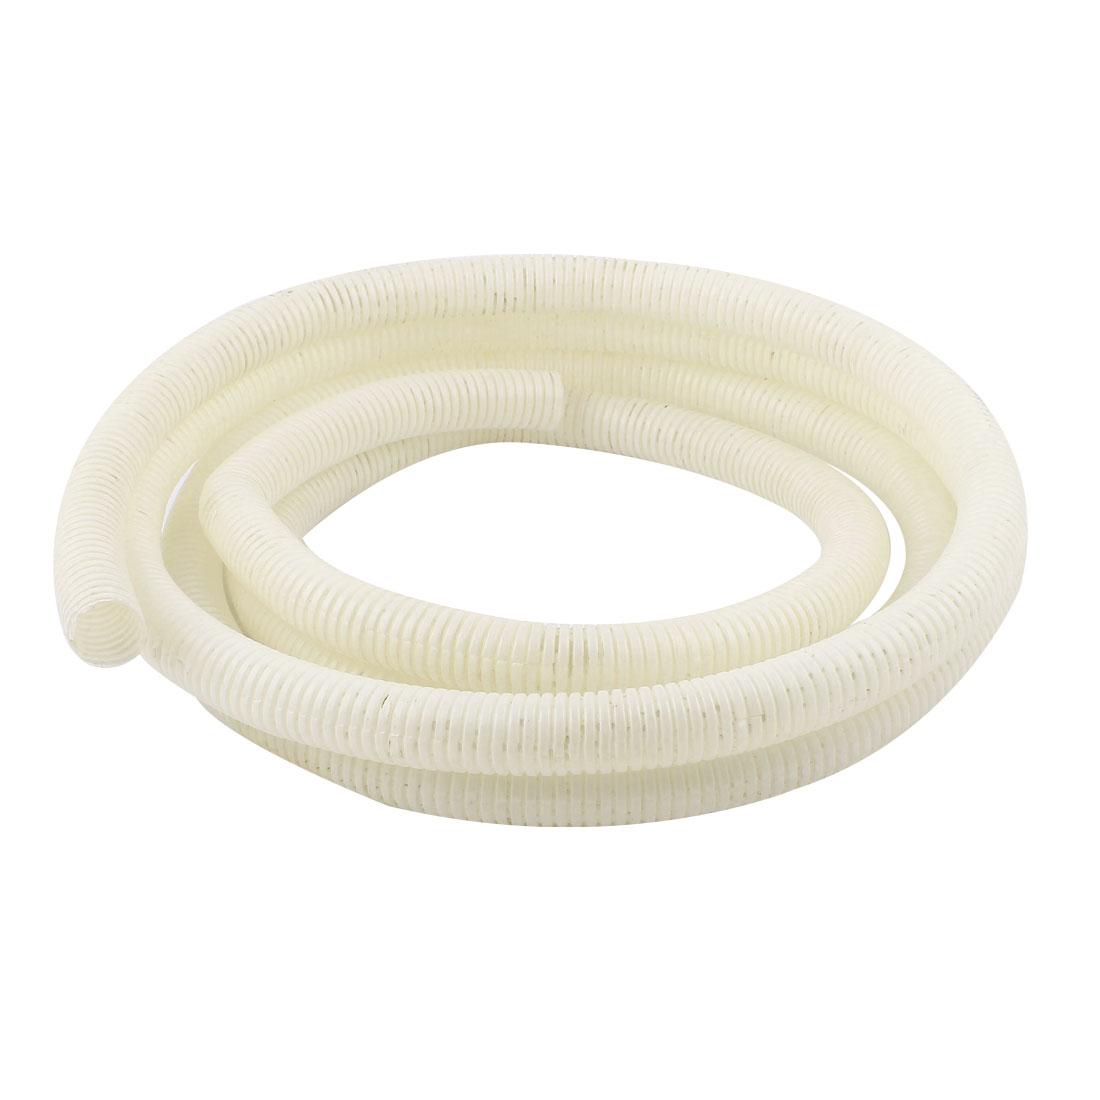 25mm Dia Flexible White PVC Corrugated Wire Tubing Gas Conduit Tube Pipe 3.5M 11ft Long